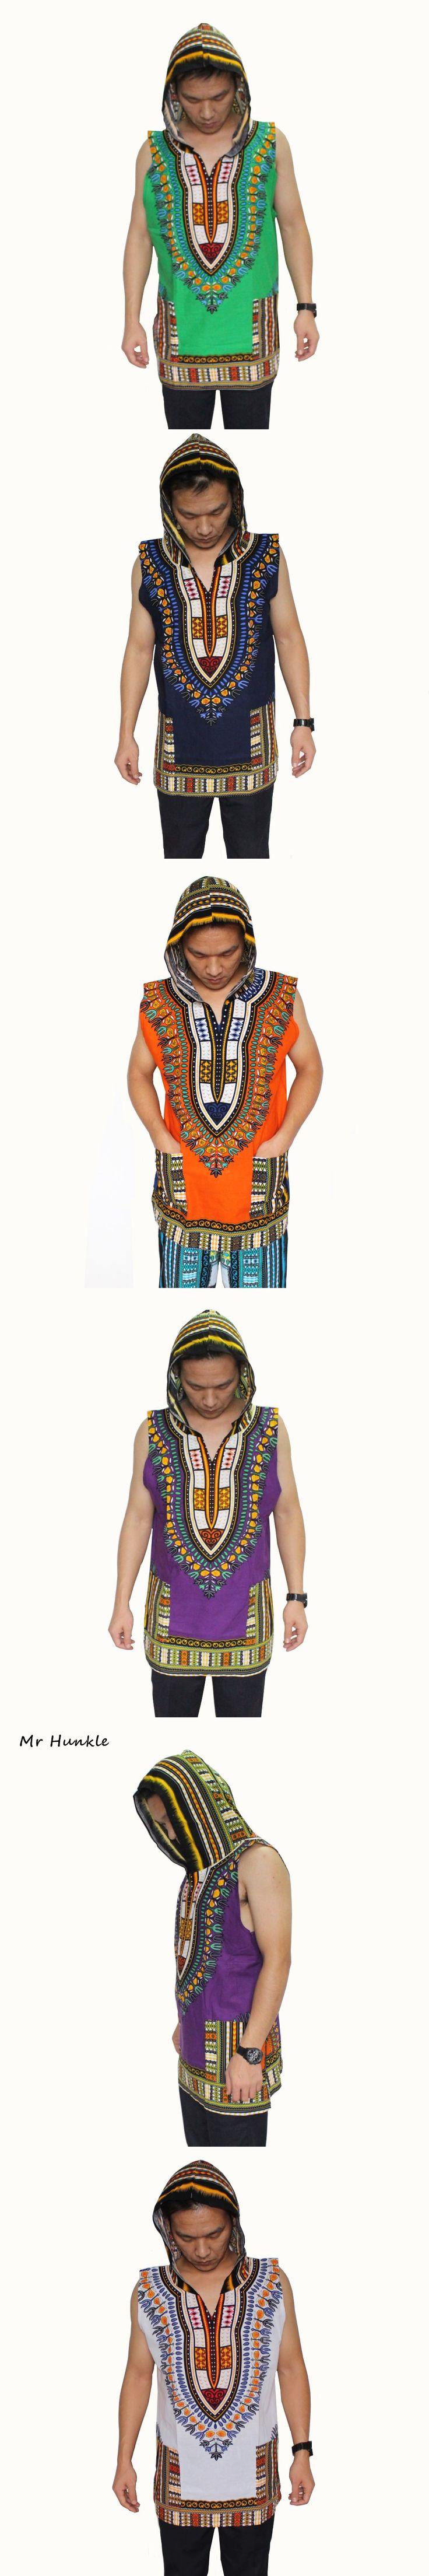 Mr Hunkle New Fashion Dashiki Hoodies Loose Sleeveless African Print Dashiki Fabric Hood 100% Cotton Robe Clothing Unisex Kimono